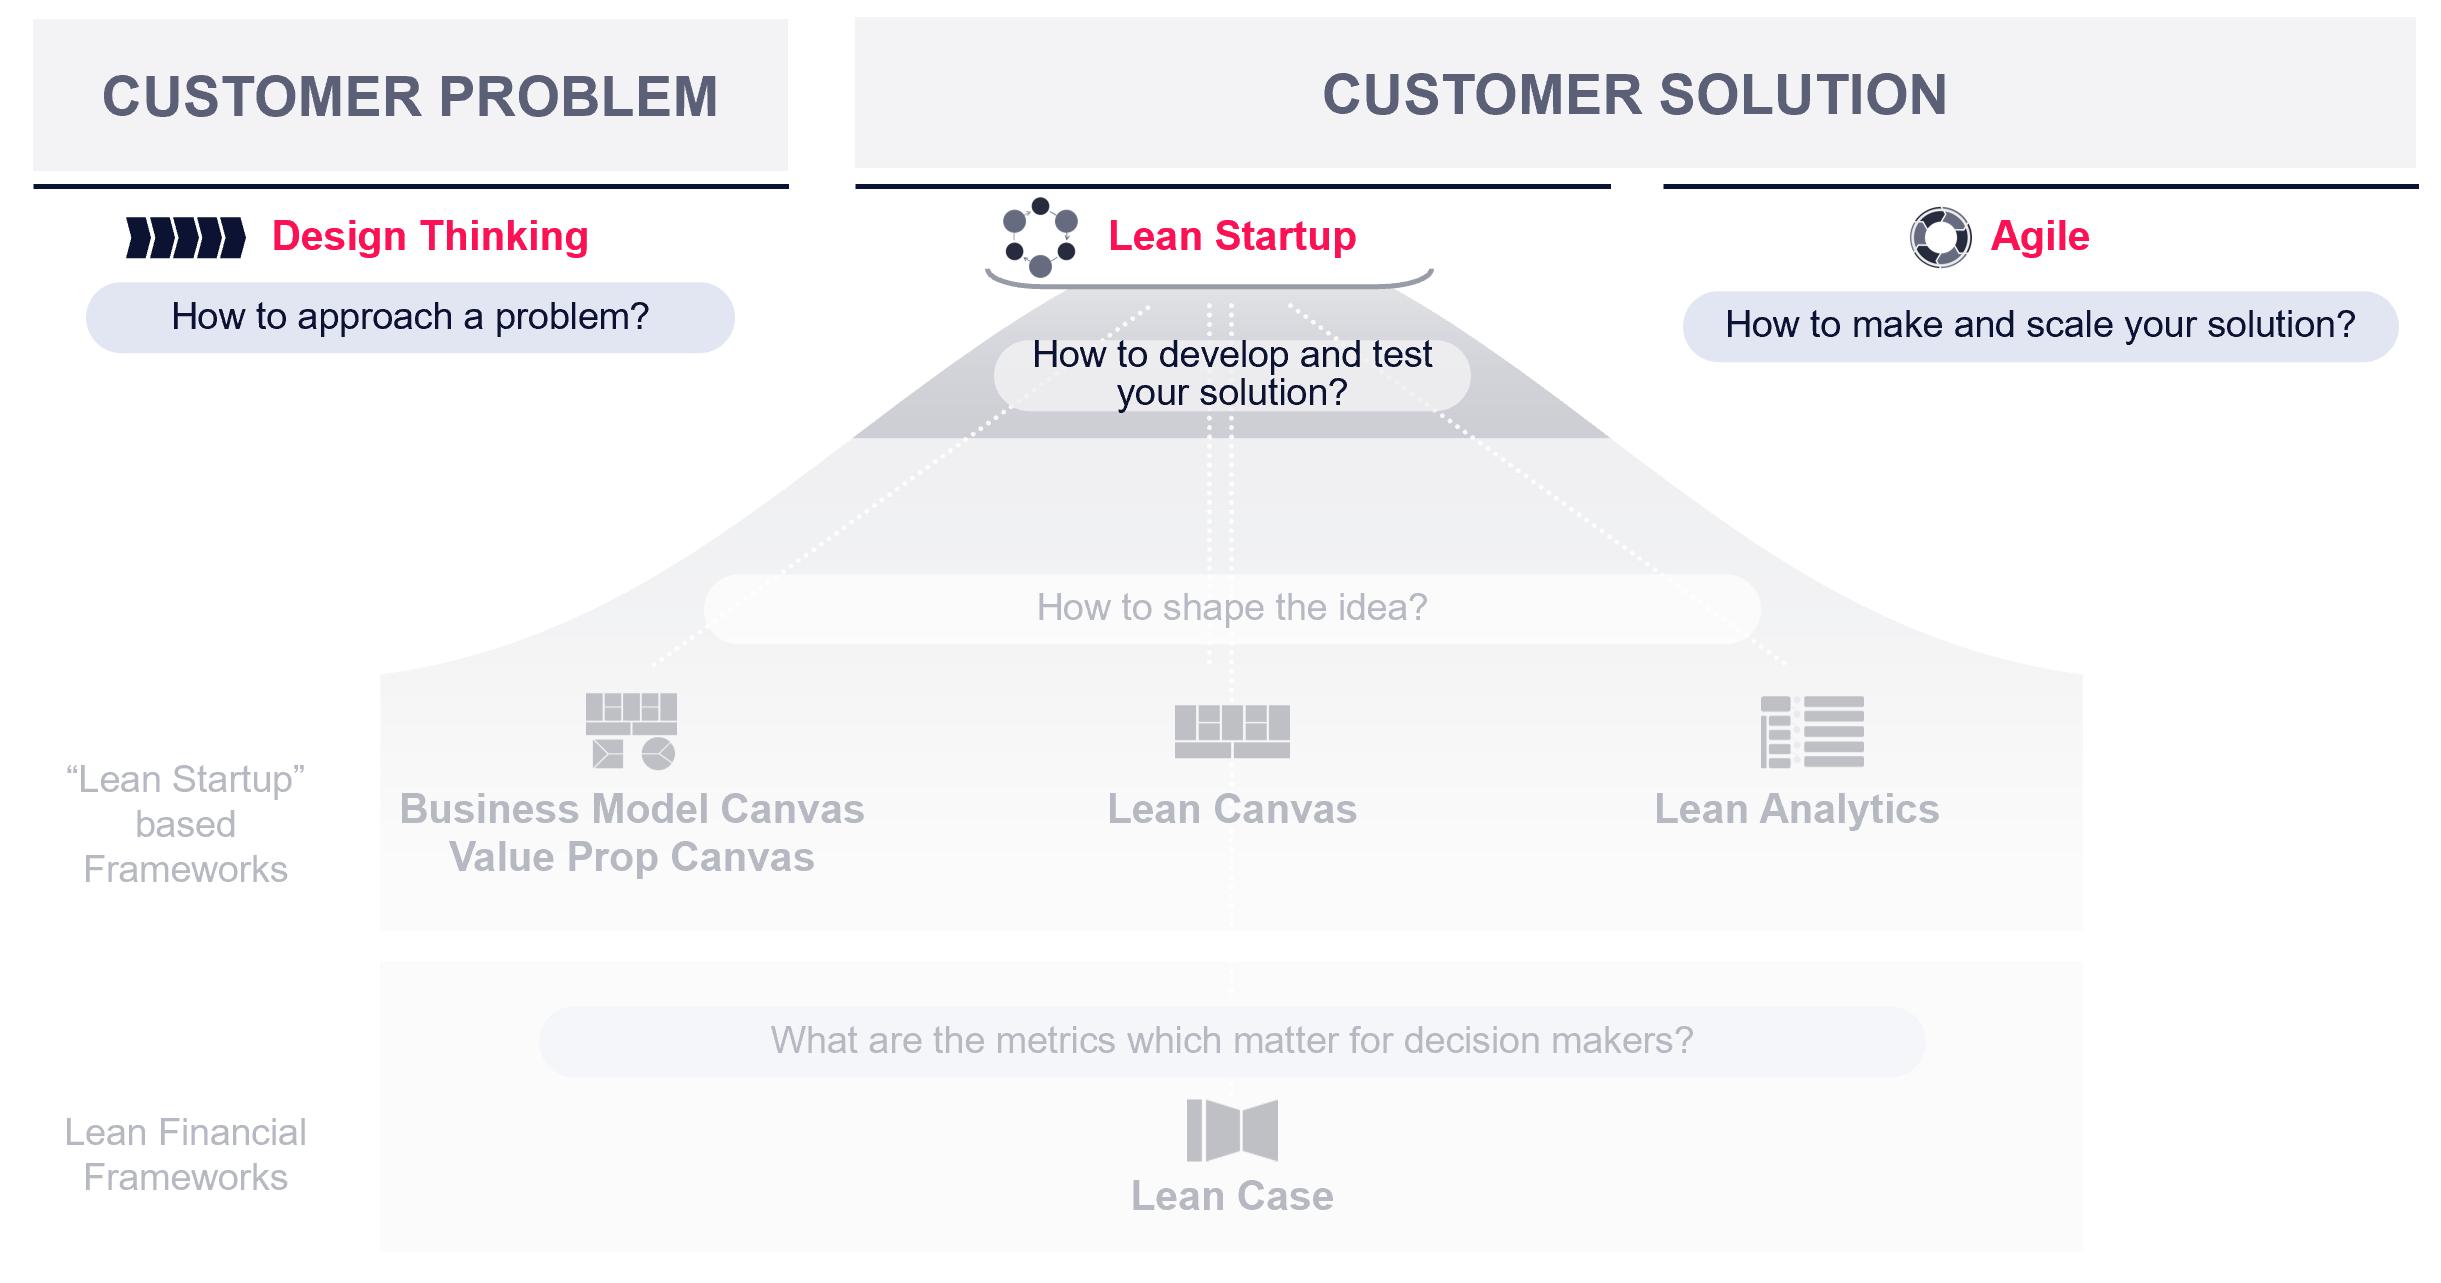 Business Model Frameworks Design Thinking Lean Startup Agile